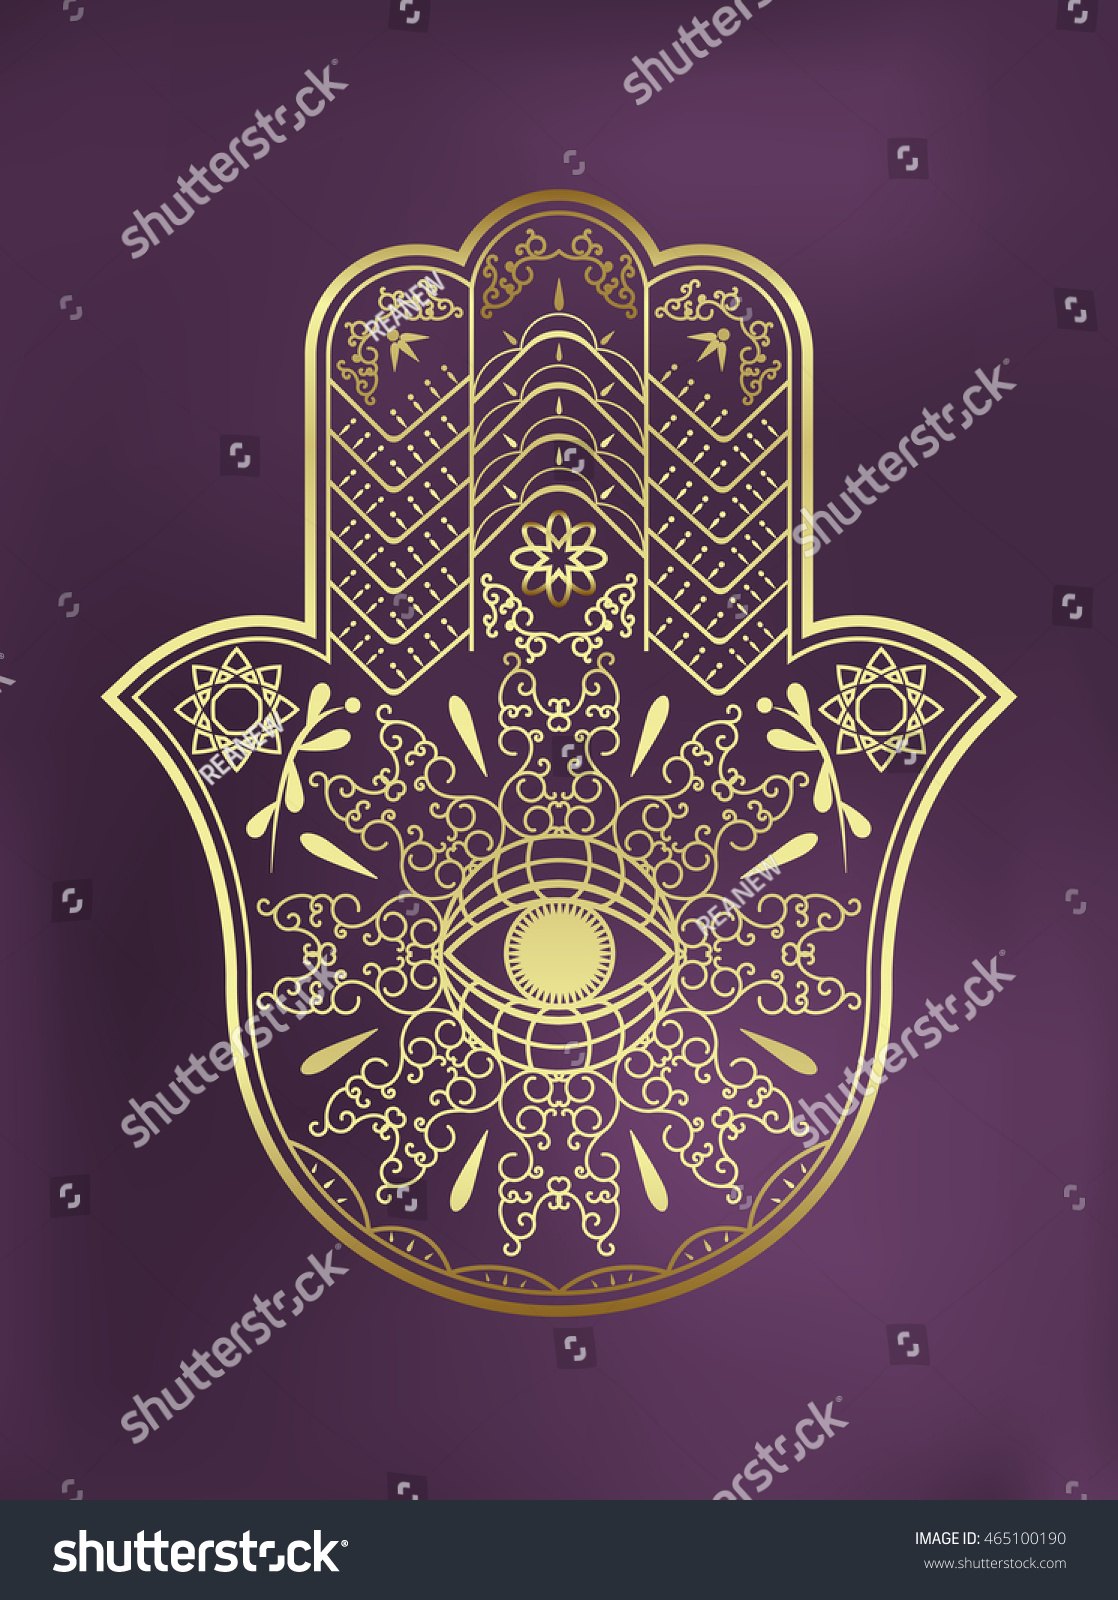 Elegant Ornate Hand Drawn Hamsa Hand Stock Vector Royalty Free